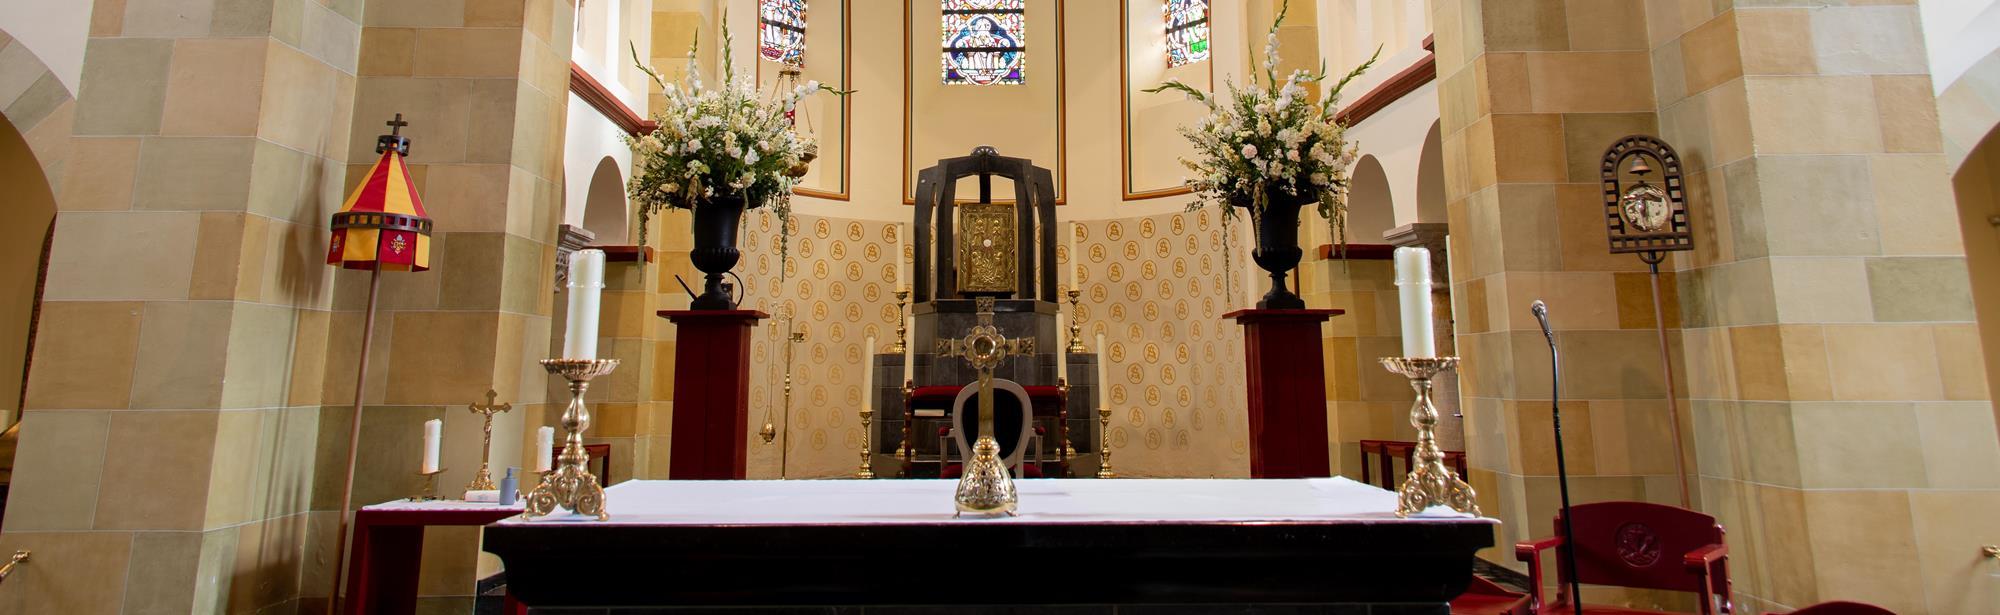 Basiliek Heilige Amelberga